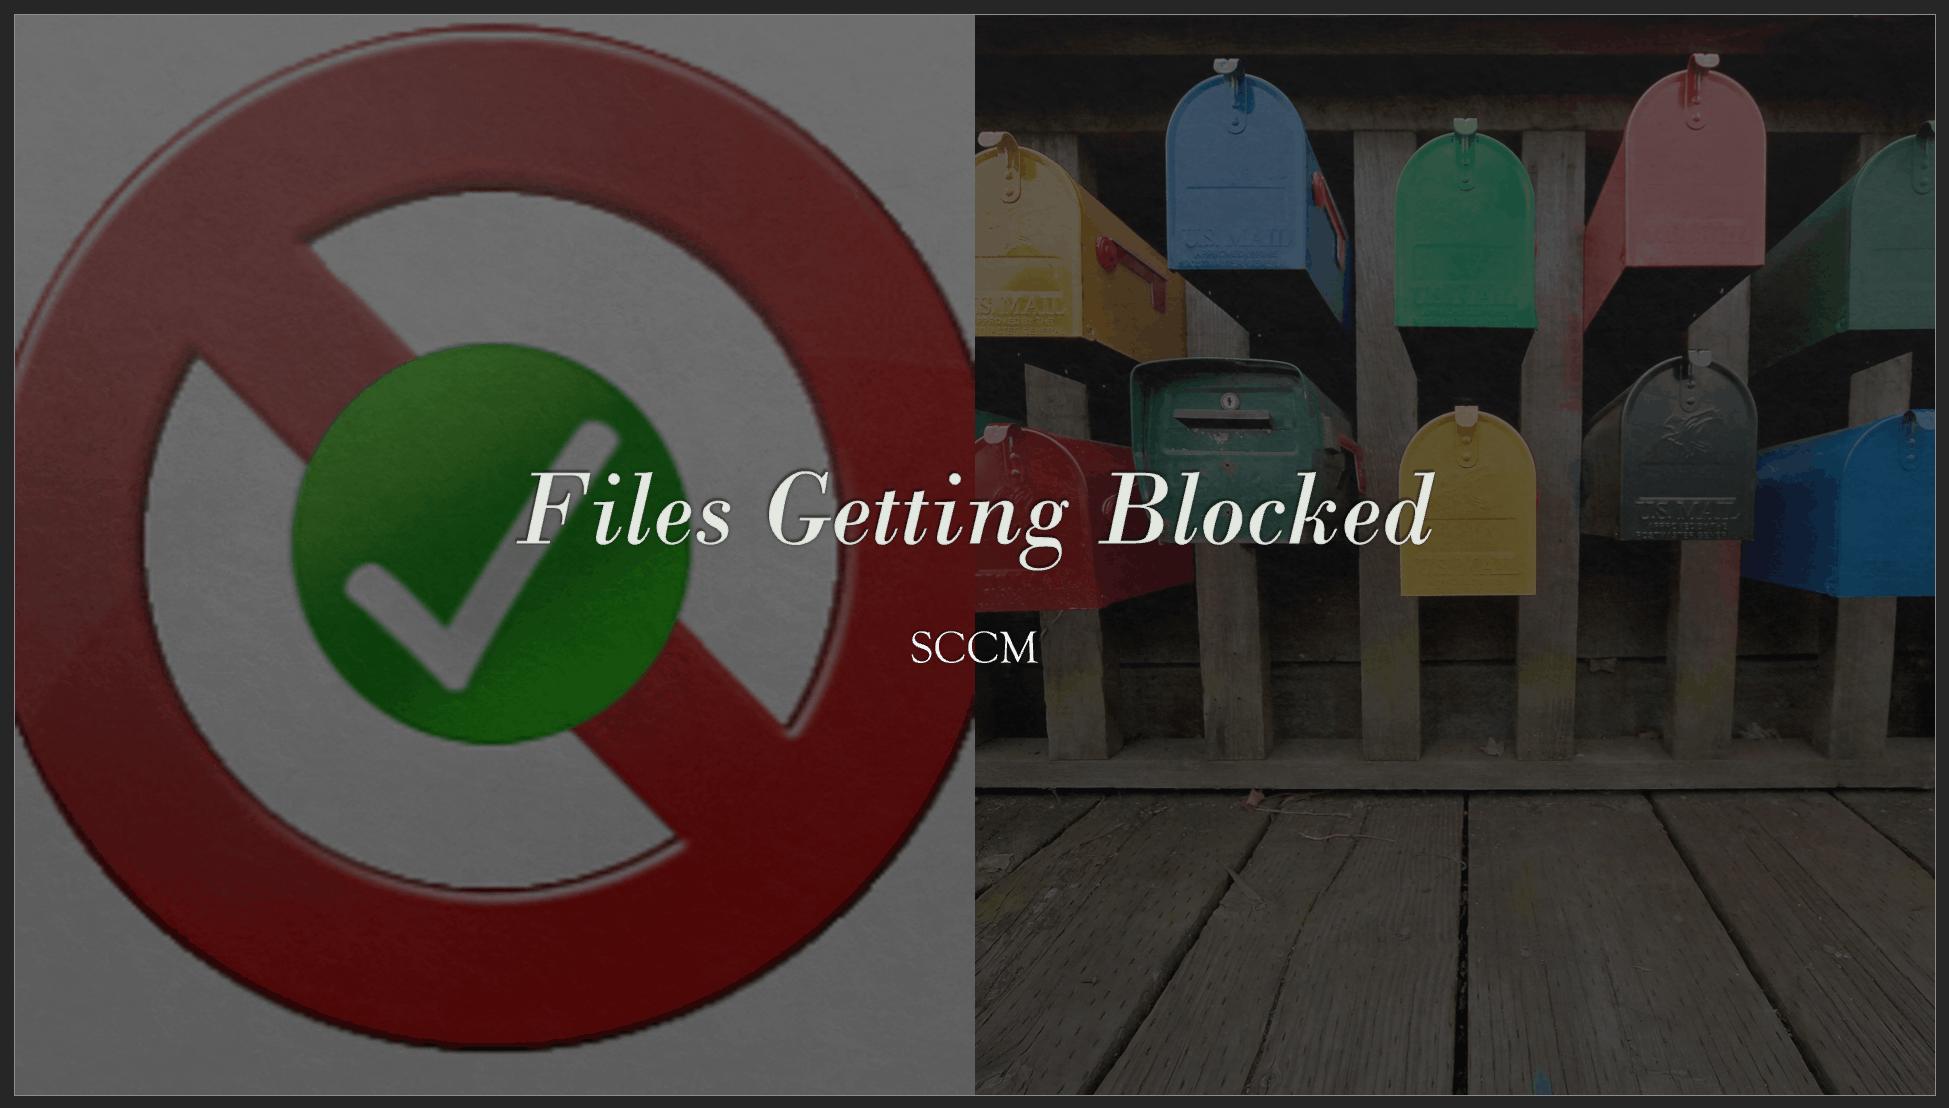 Files Getting Blocked